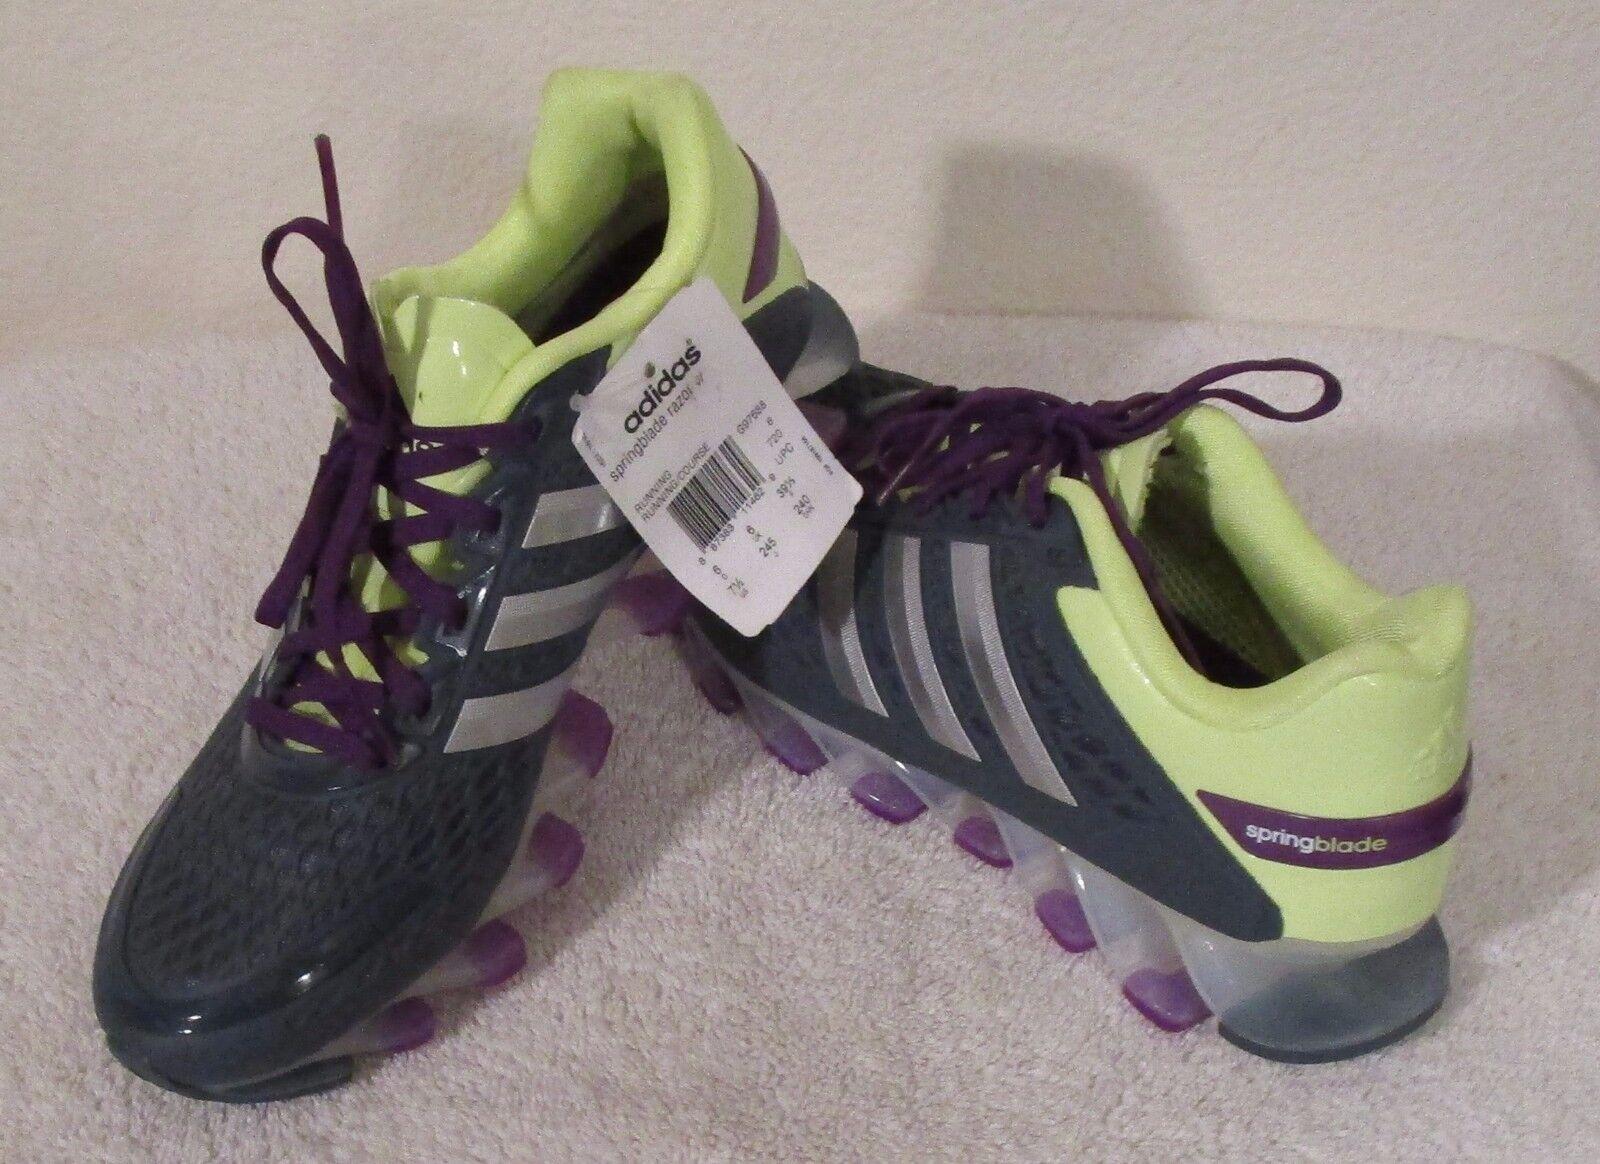 NWT Adidas Springblade Razor Damenschuhe Schuhes Running Schuhes Damenschuhe 7.5 Charcoal MSRP140 710662